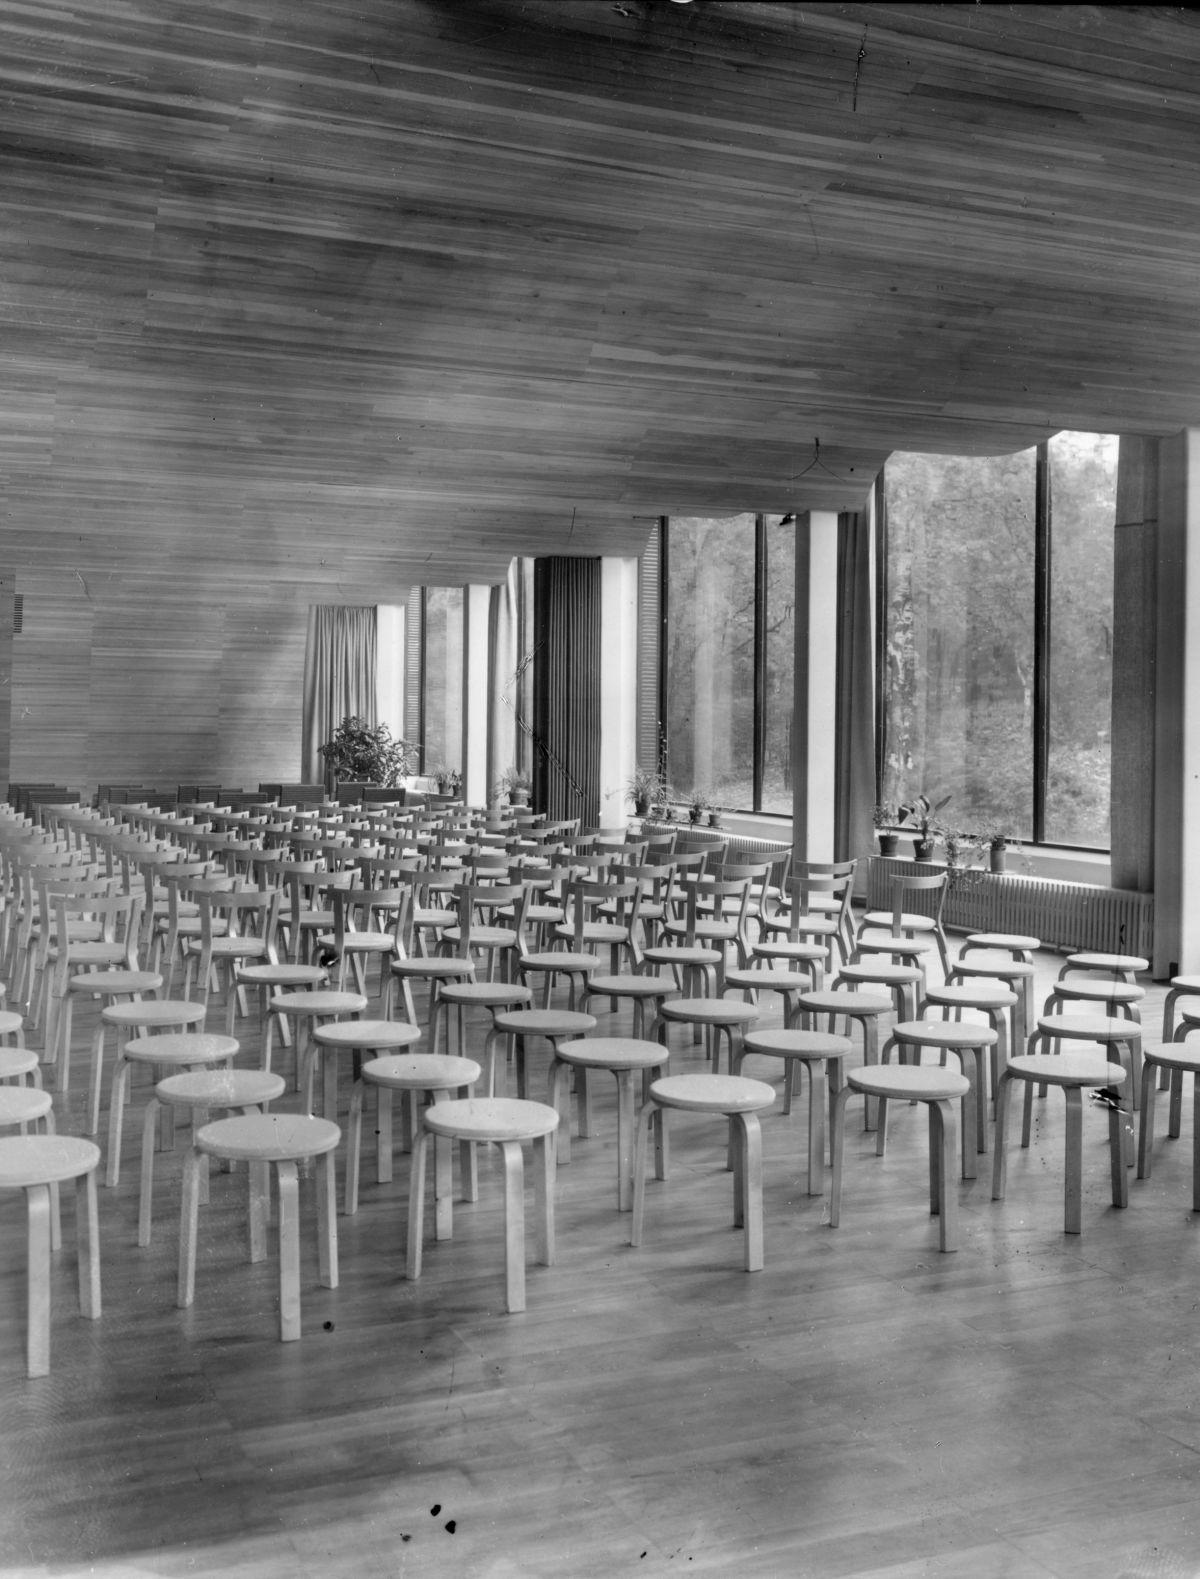 Vyborg Library historical photo